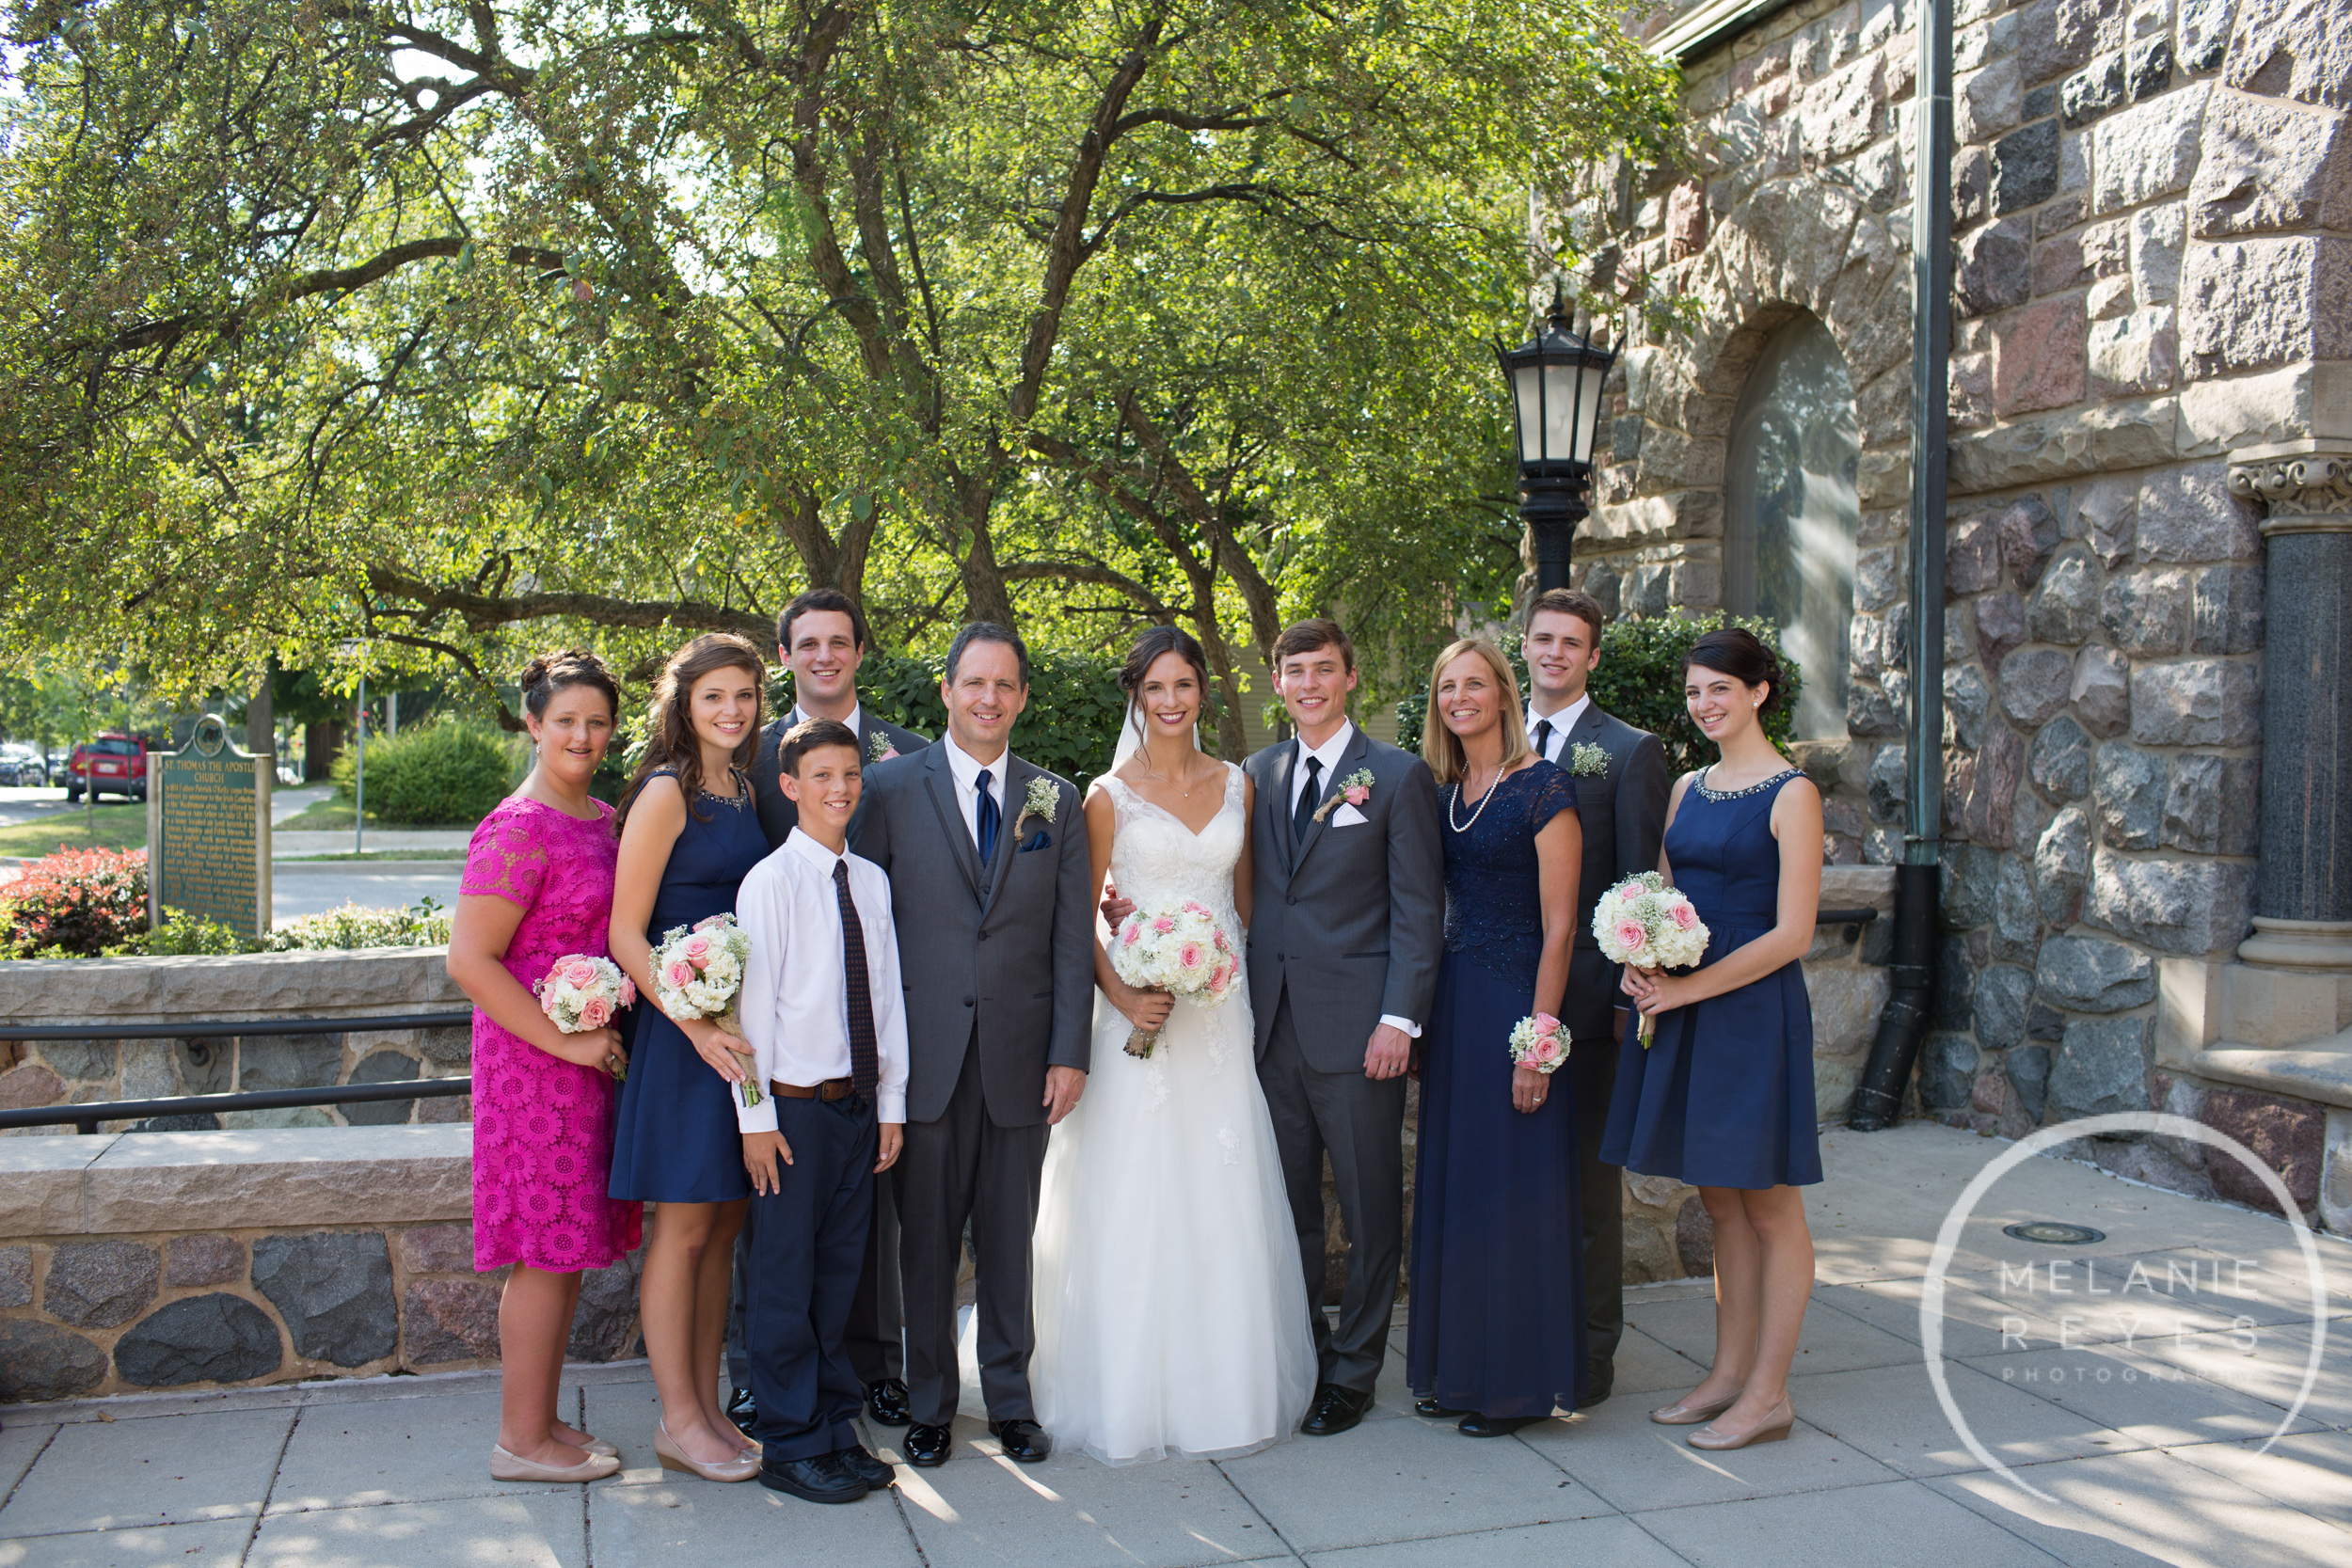 st_thomas_inn_at_st_johns_wedding_029.jpg